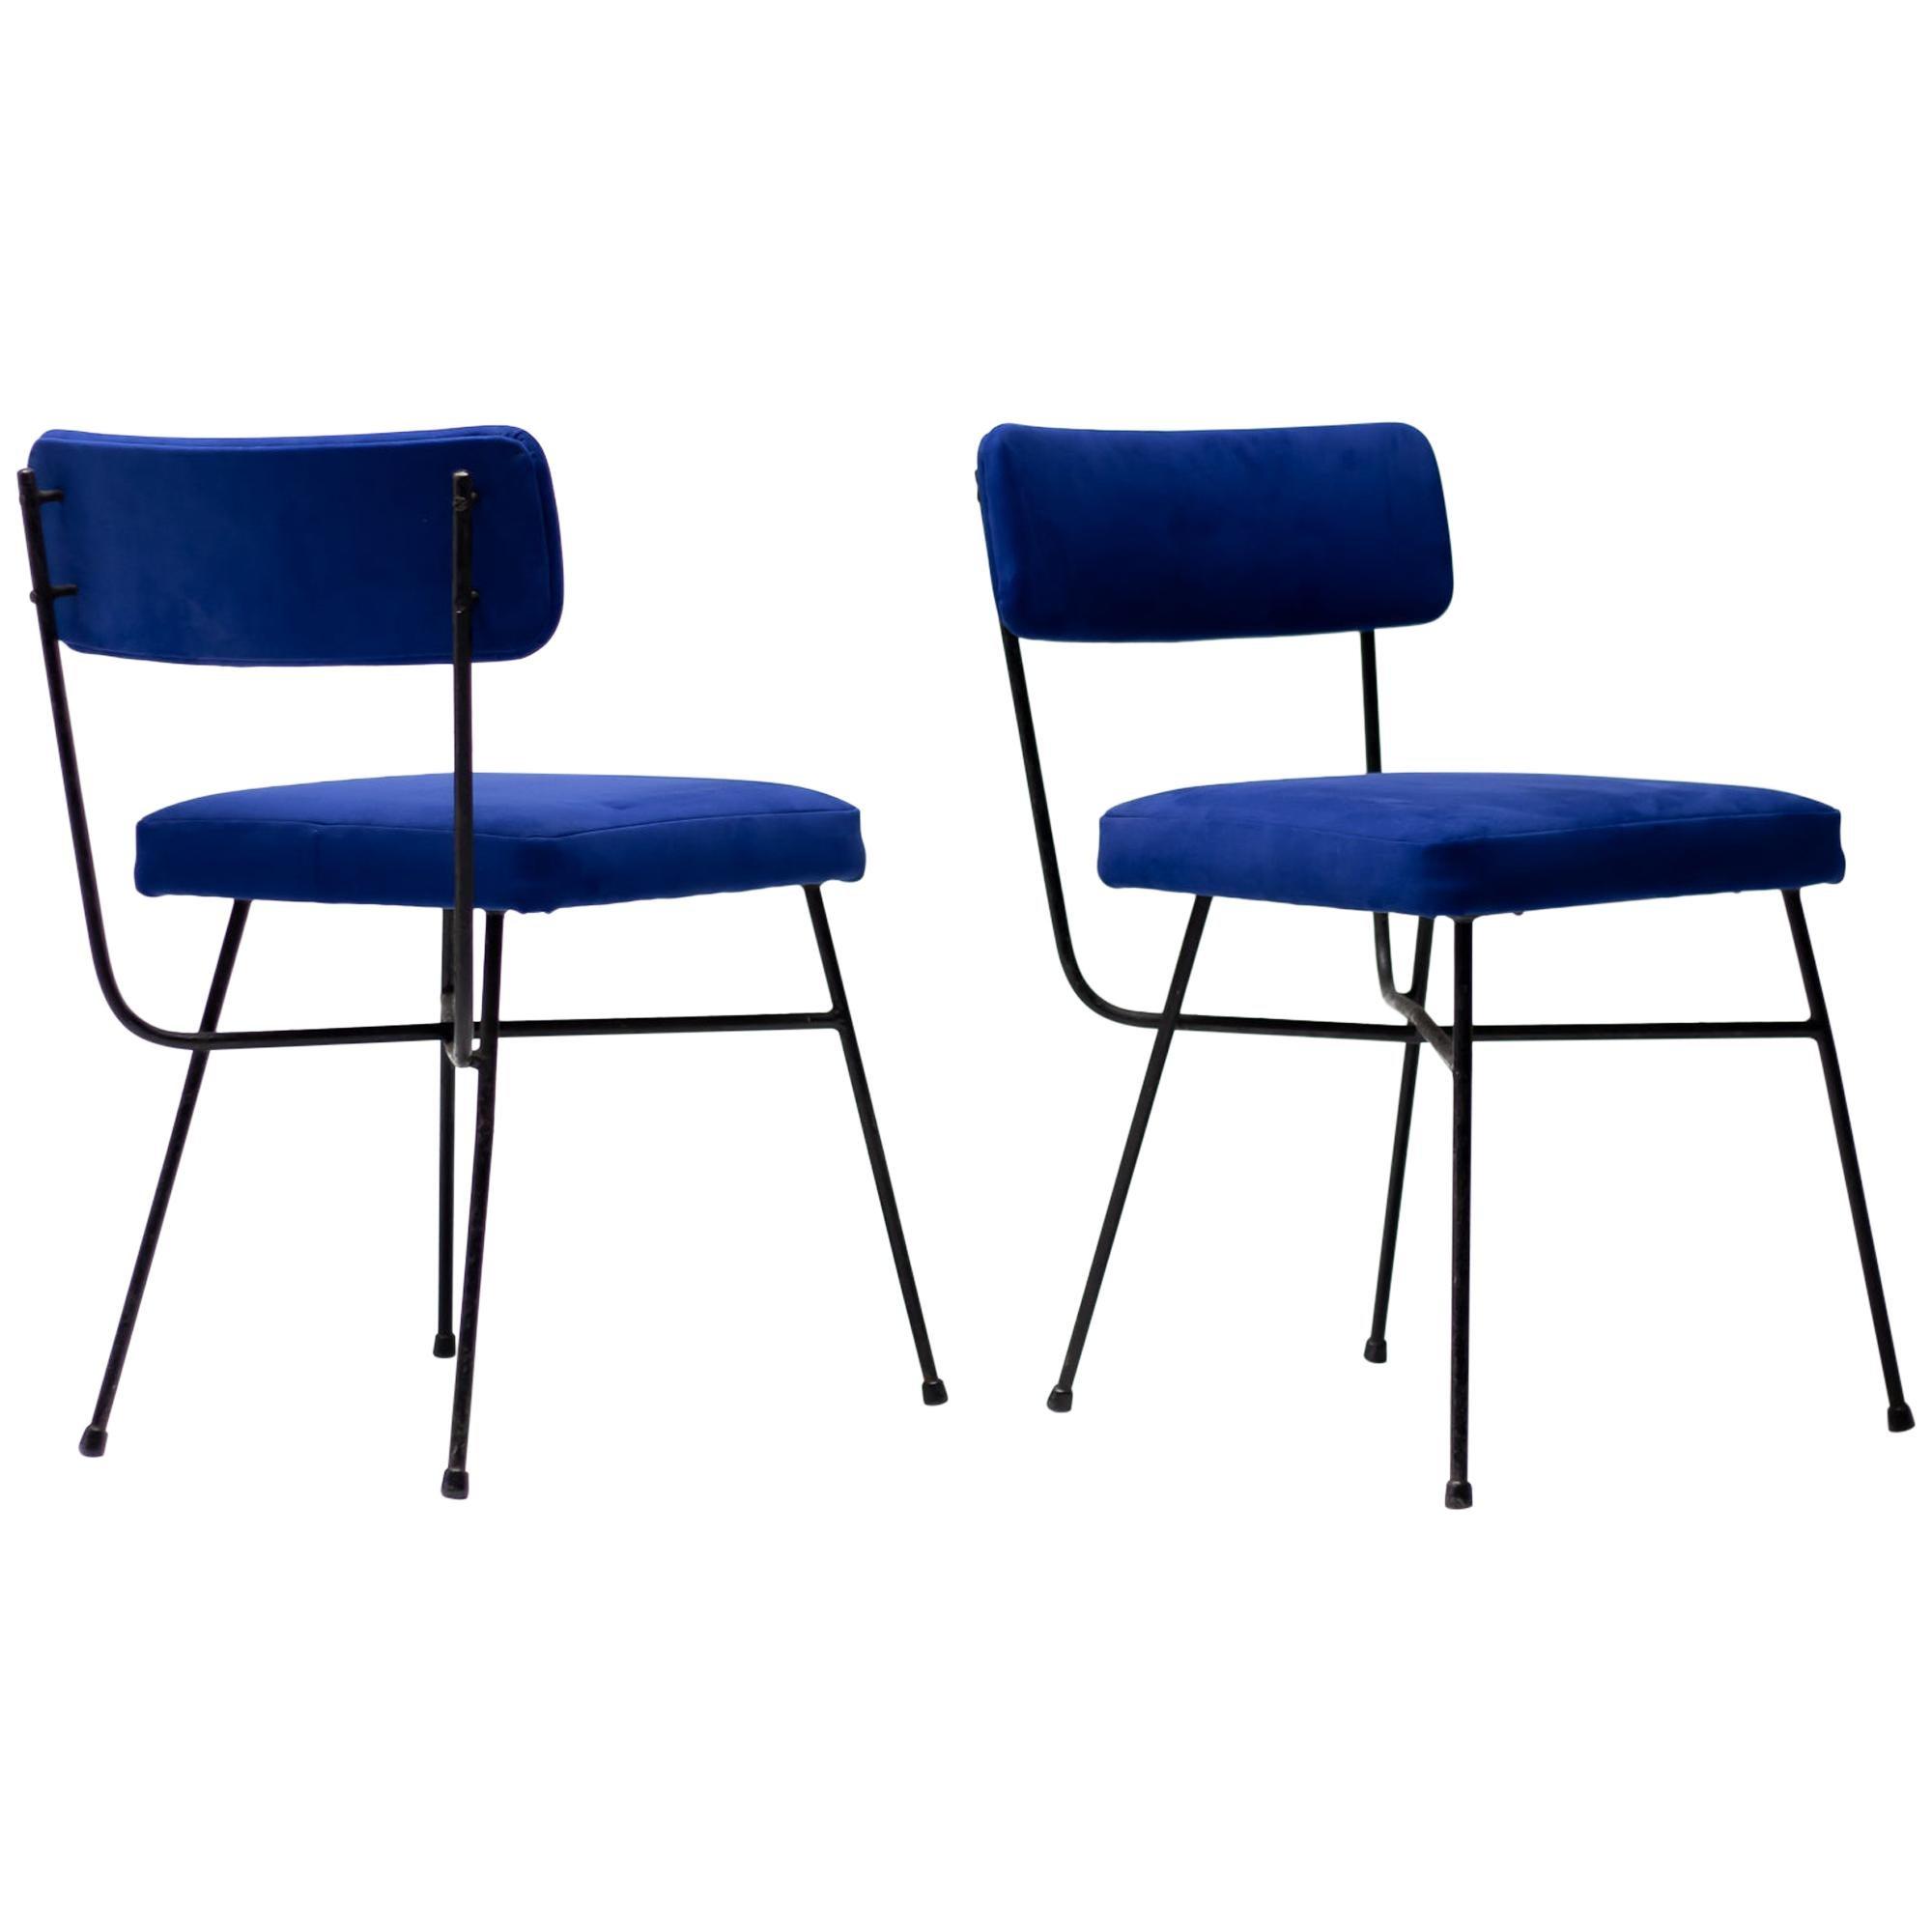 Studio BBPR Pair of Elettra Chairs by Arflex, 1954